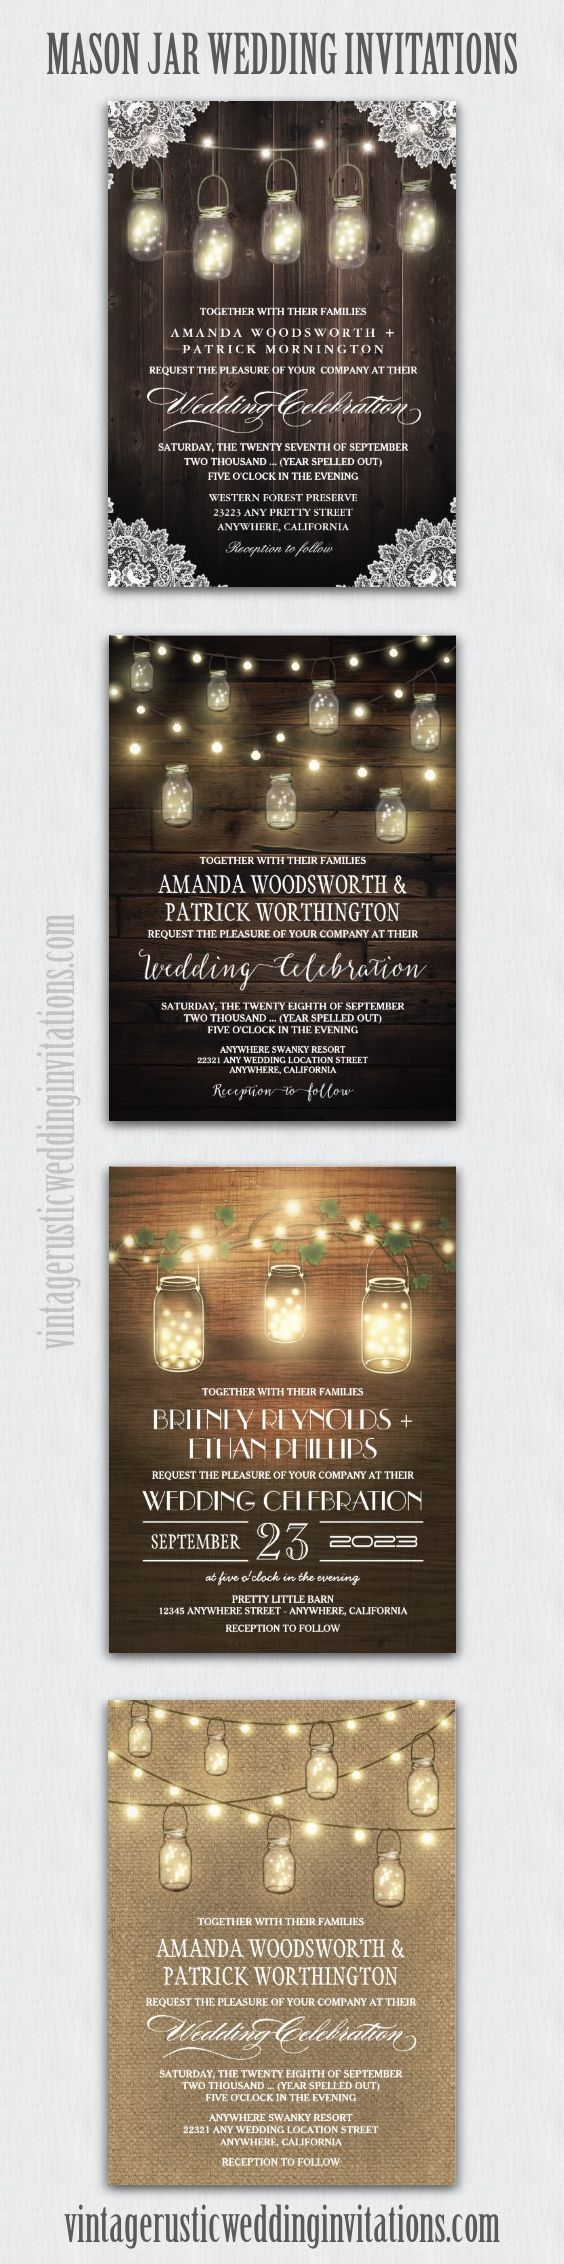 mason jar wedding invitations mason jar wedding invitations Mason jar wedding invitations barn wood burlap string lights and more in rustic